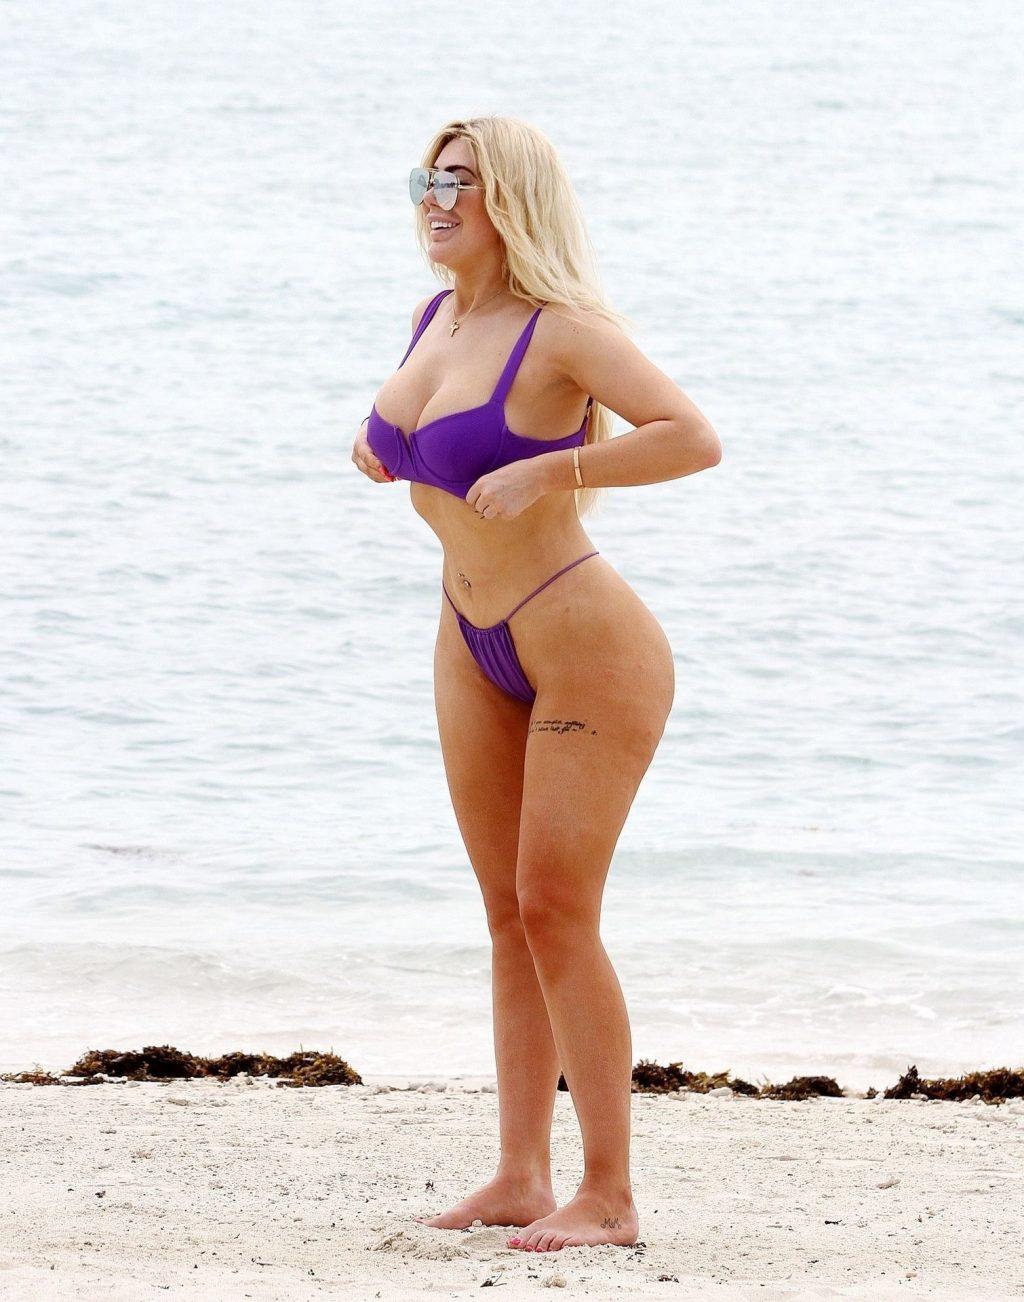 Chloe Ferry Sexy (26 New Photos)